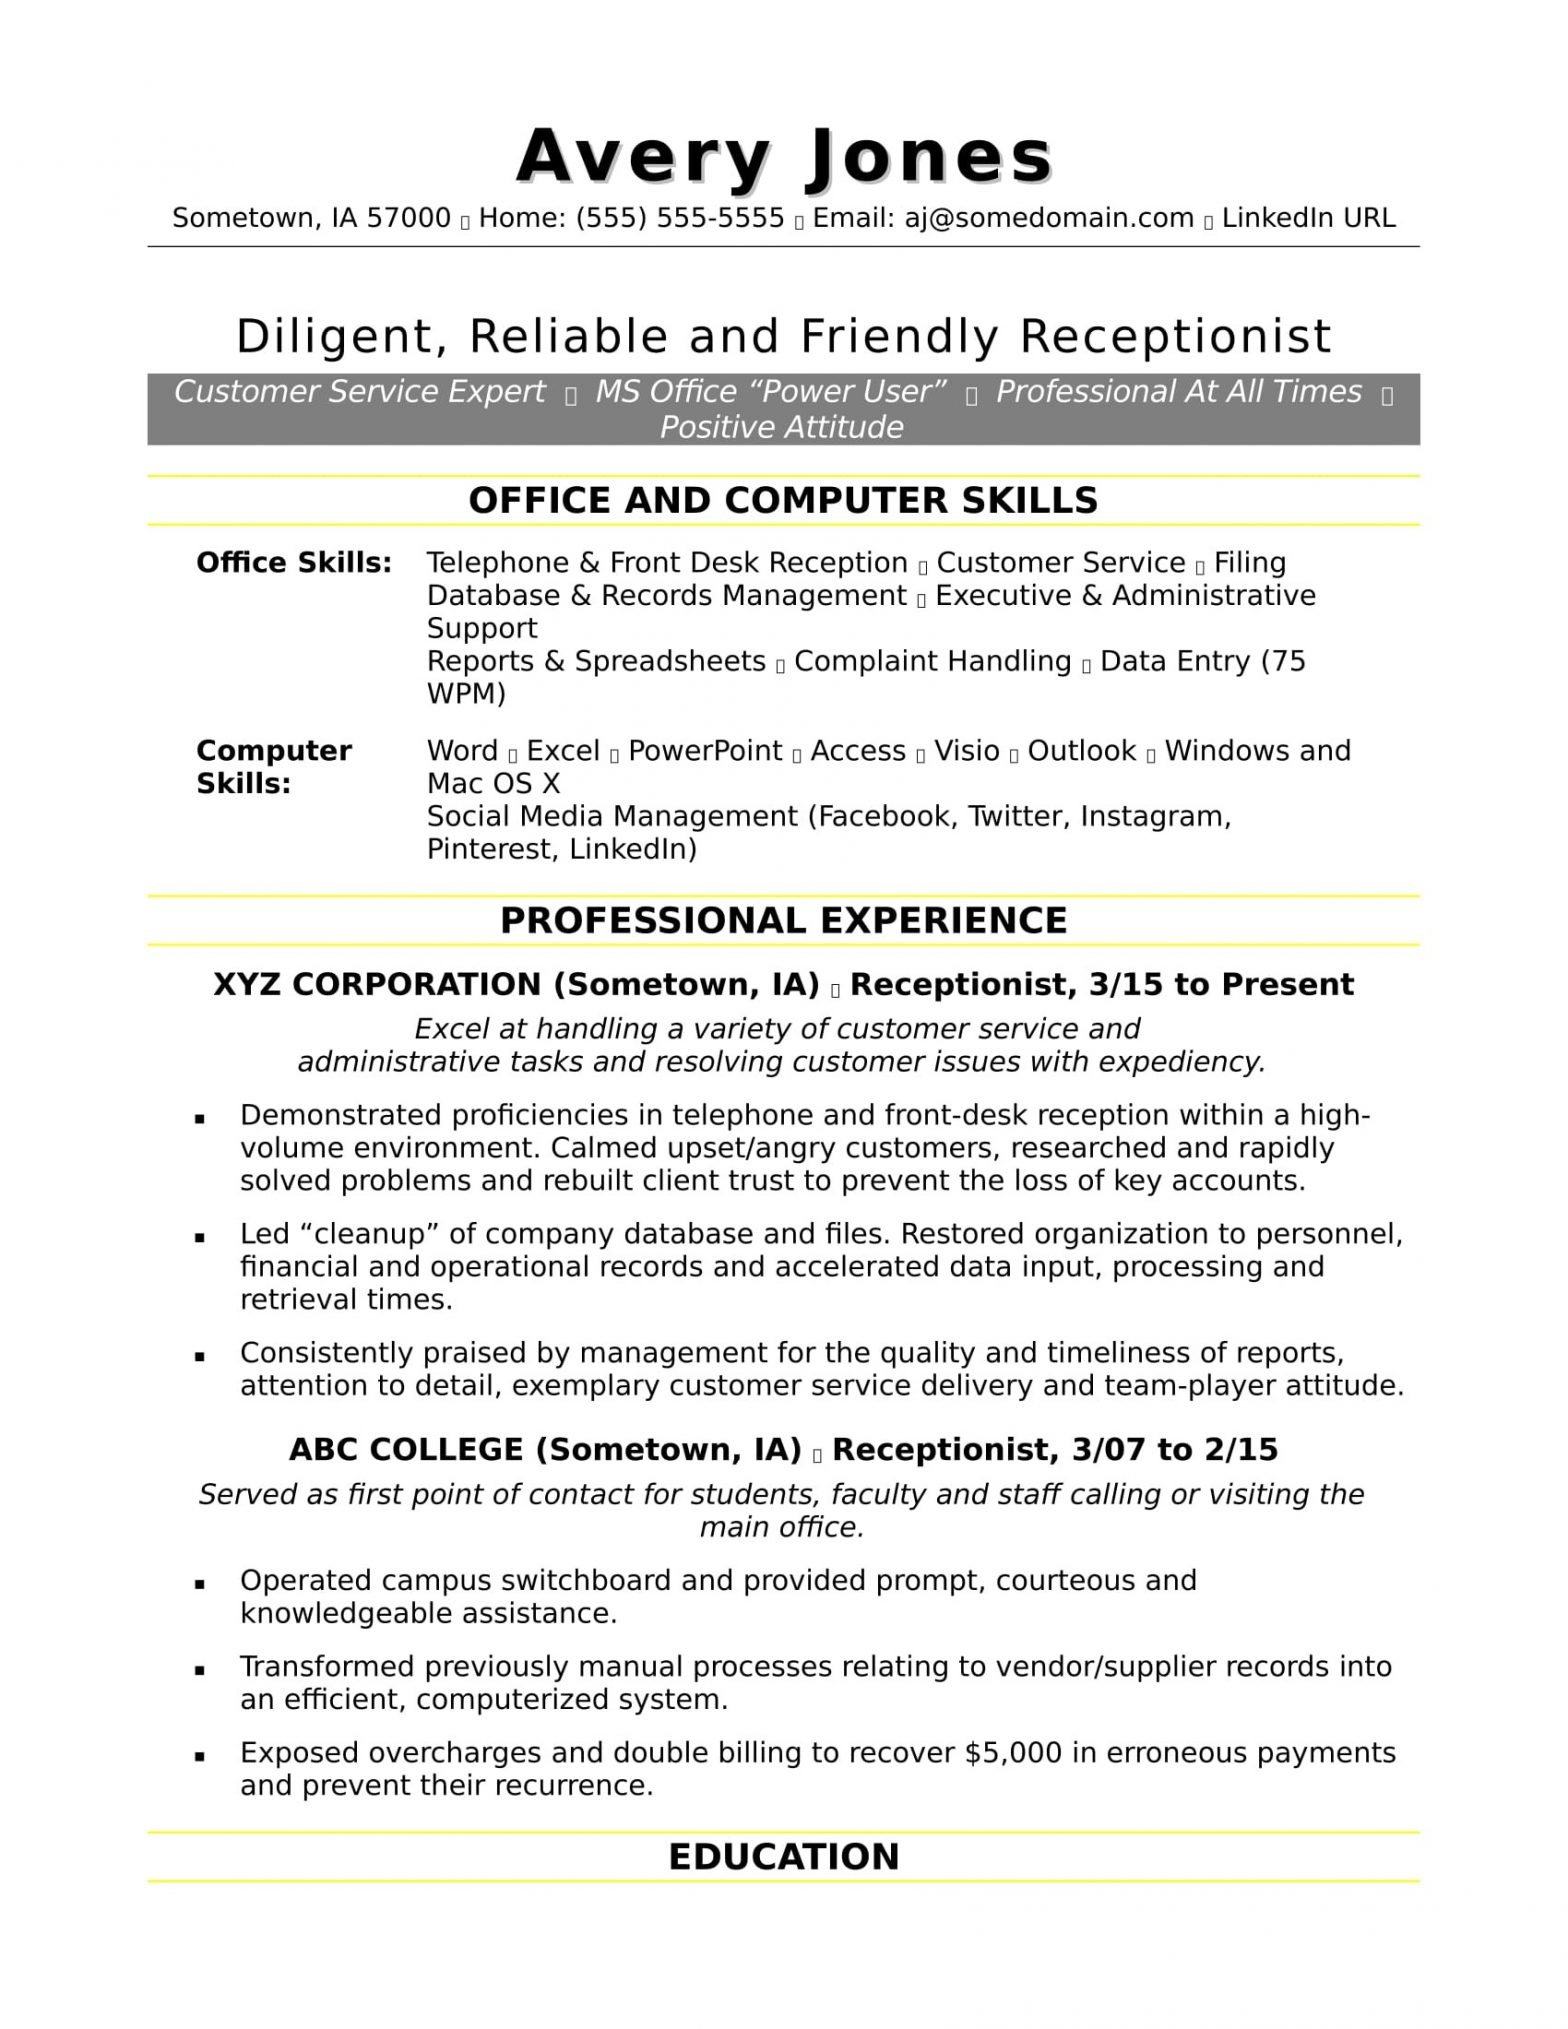 Front Desk Receptionist Reception Resume Sample Receptionist Resume Sample Monster.com